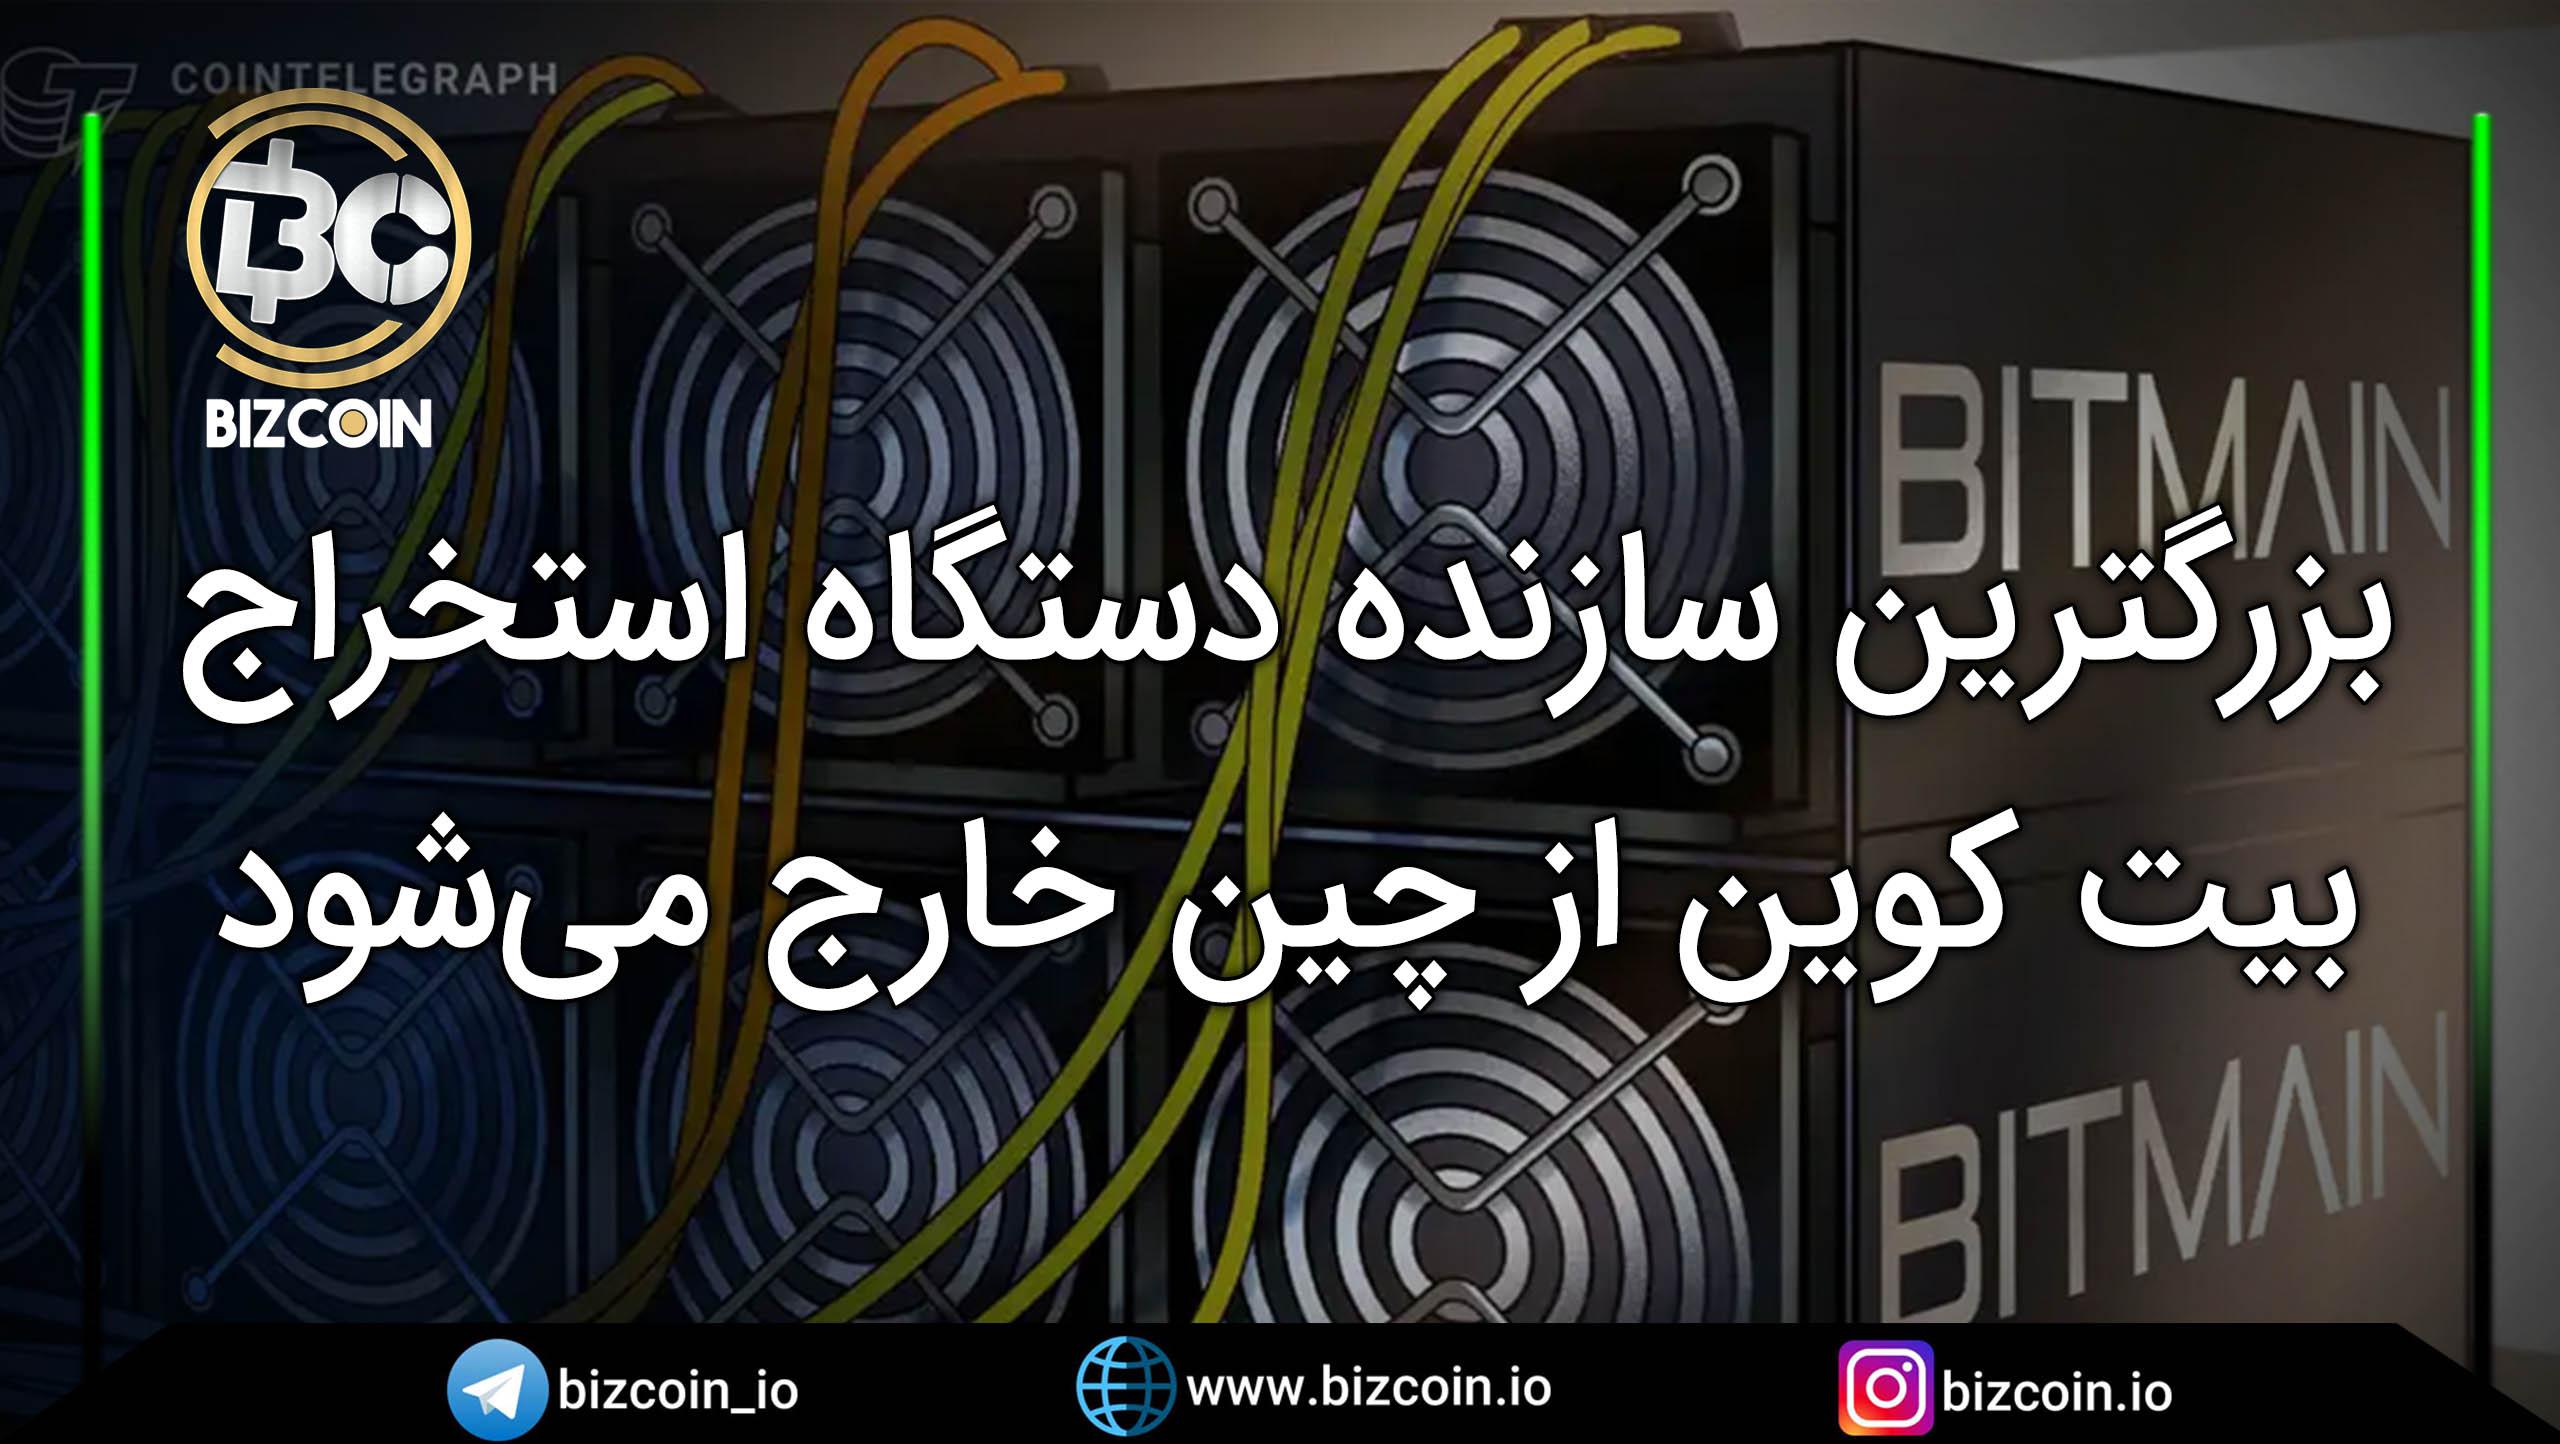 The largest manufacturer of bitcoin mining machine is exported from China بزرگترین سازنده دستگاه استخراج بیت کوین از چین خارج میشود